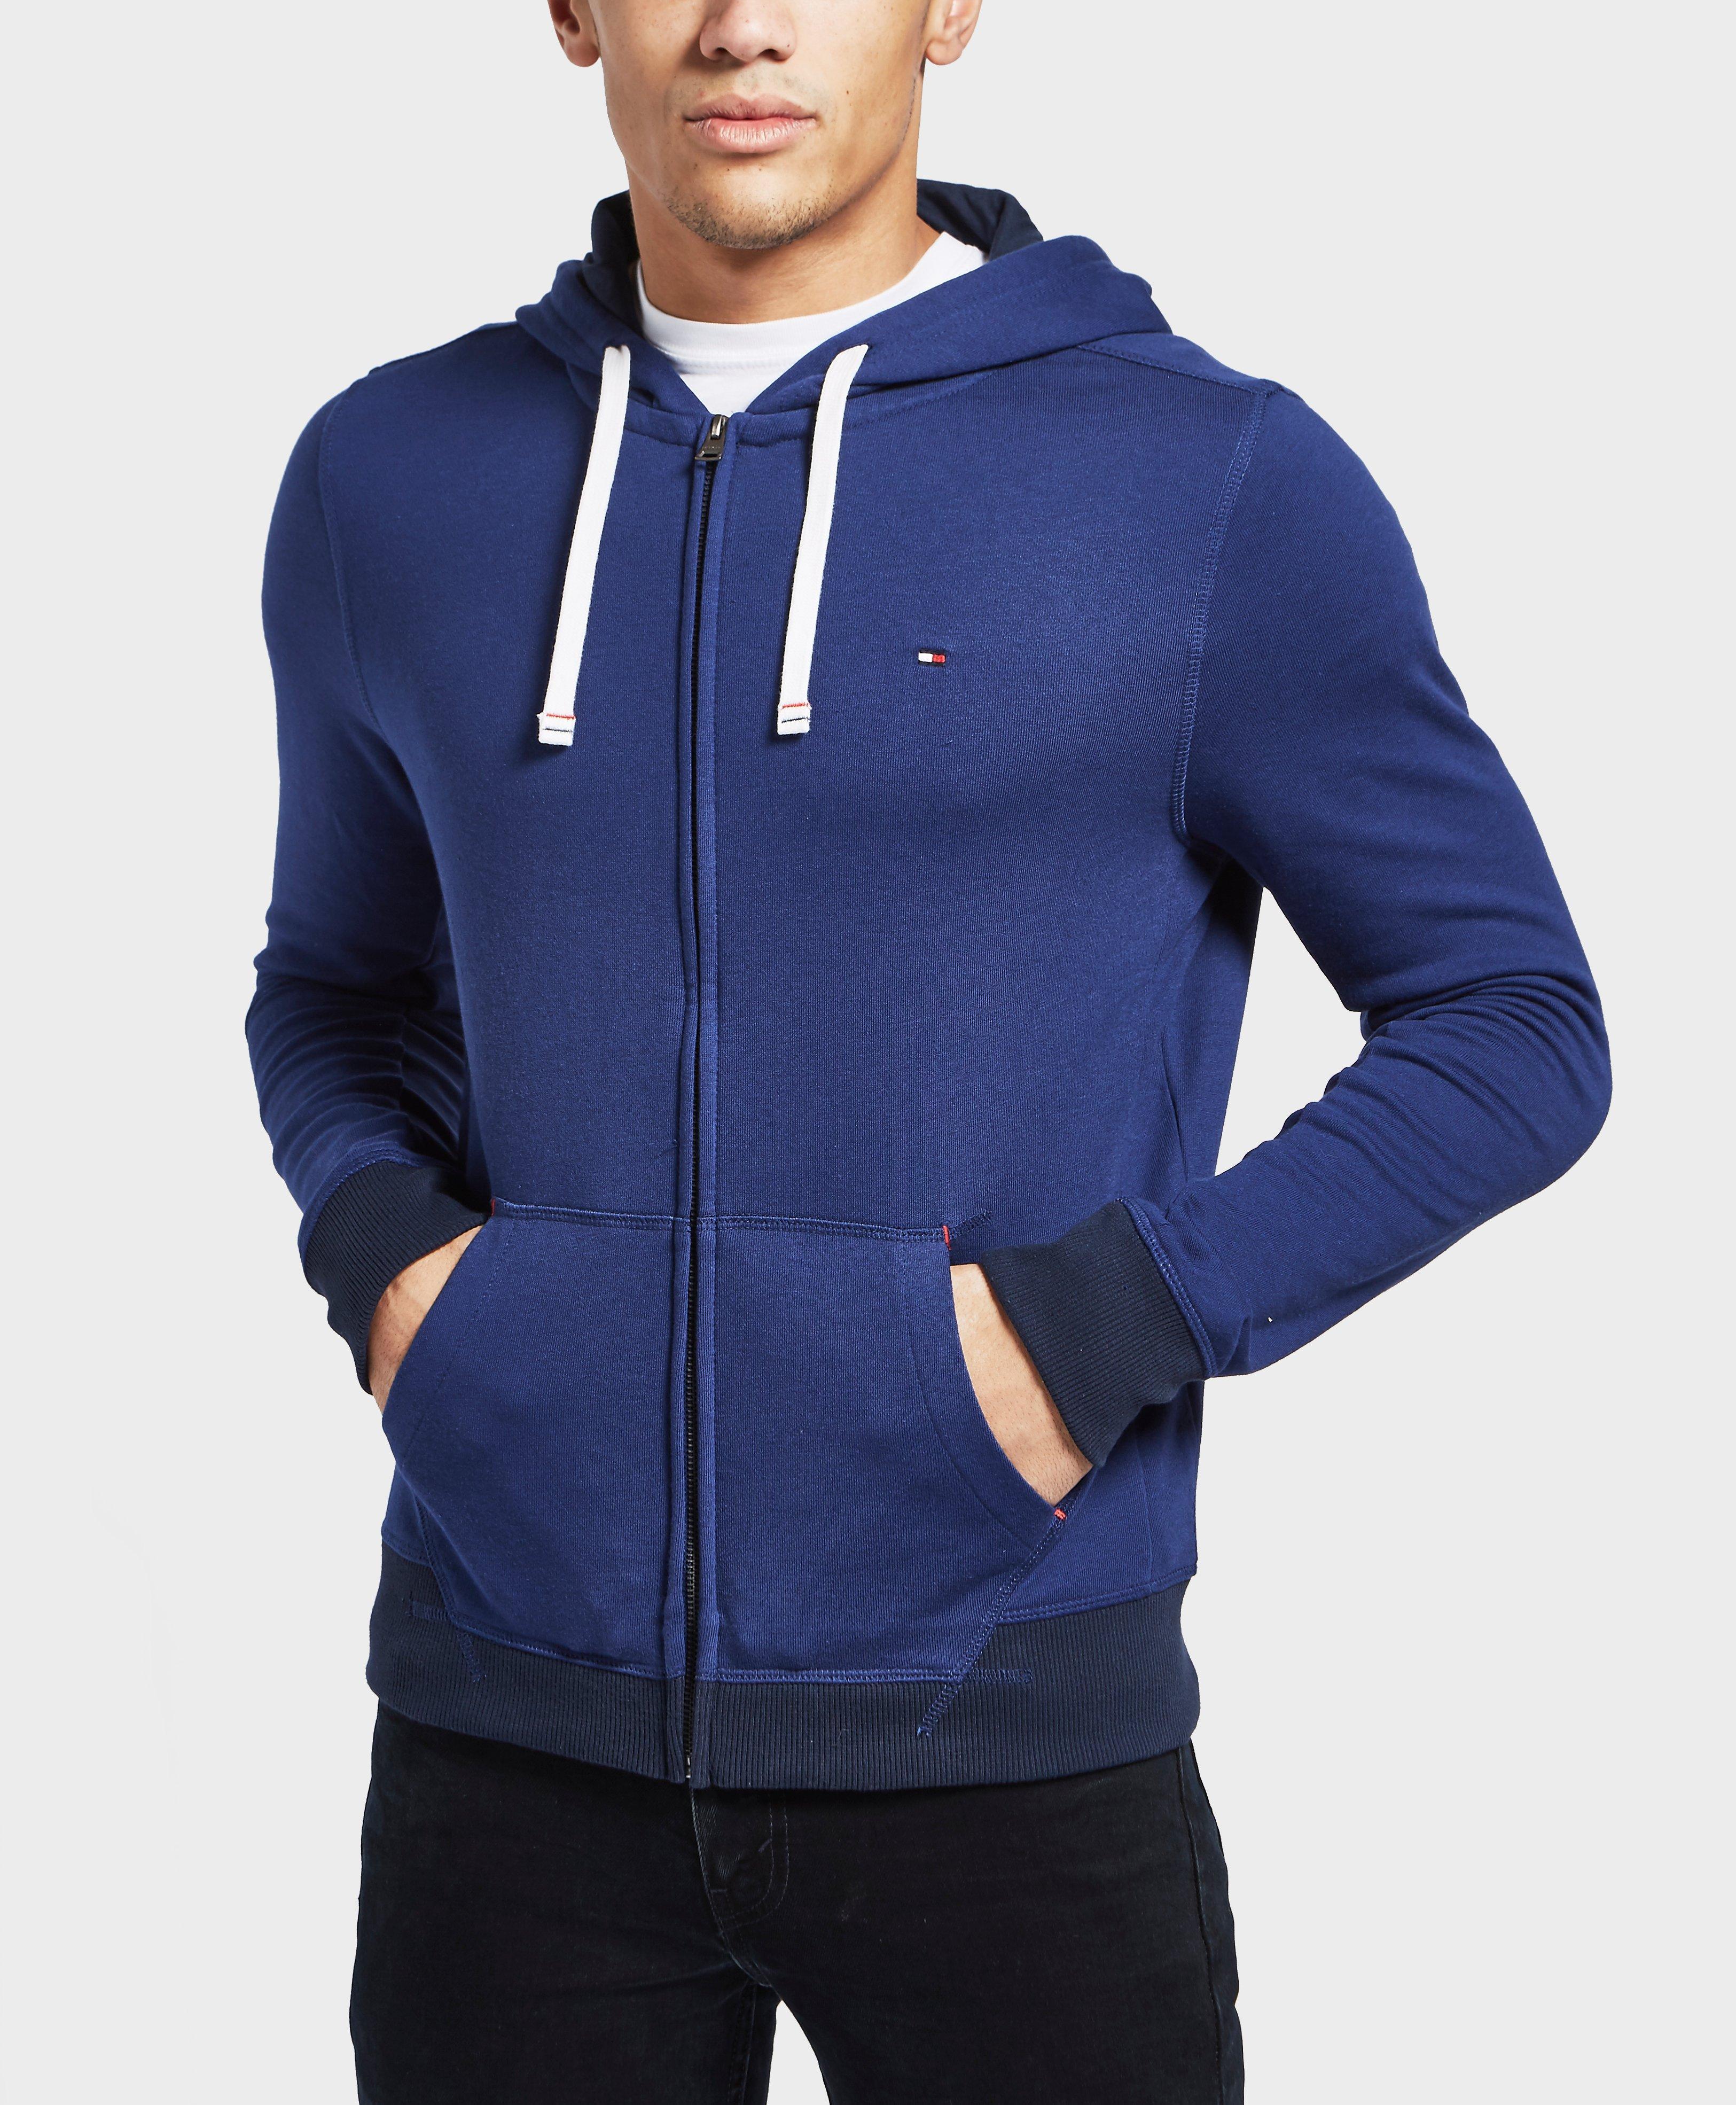 lyst tommy hilfiger core full zip hoodie in blue for men. Black Bedroom Furniture Sets. Home Design Ideas